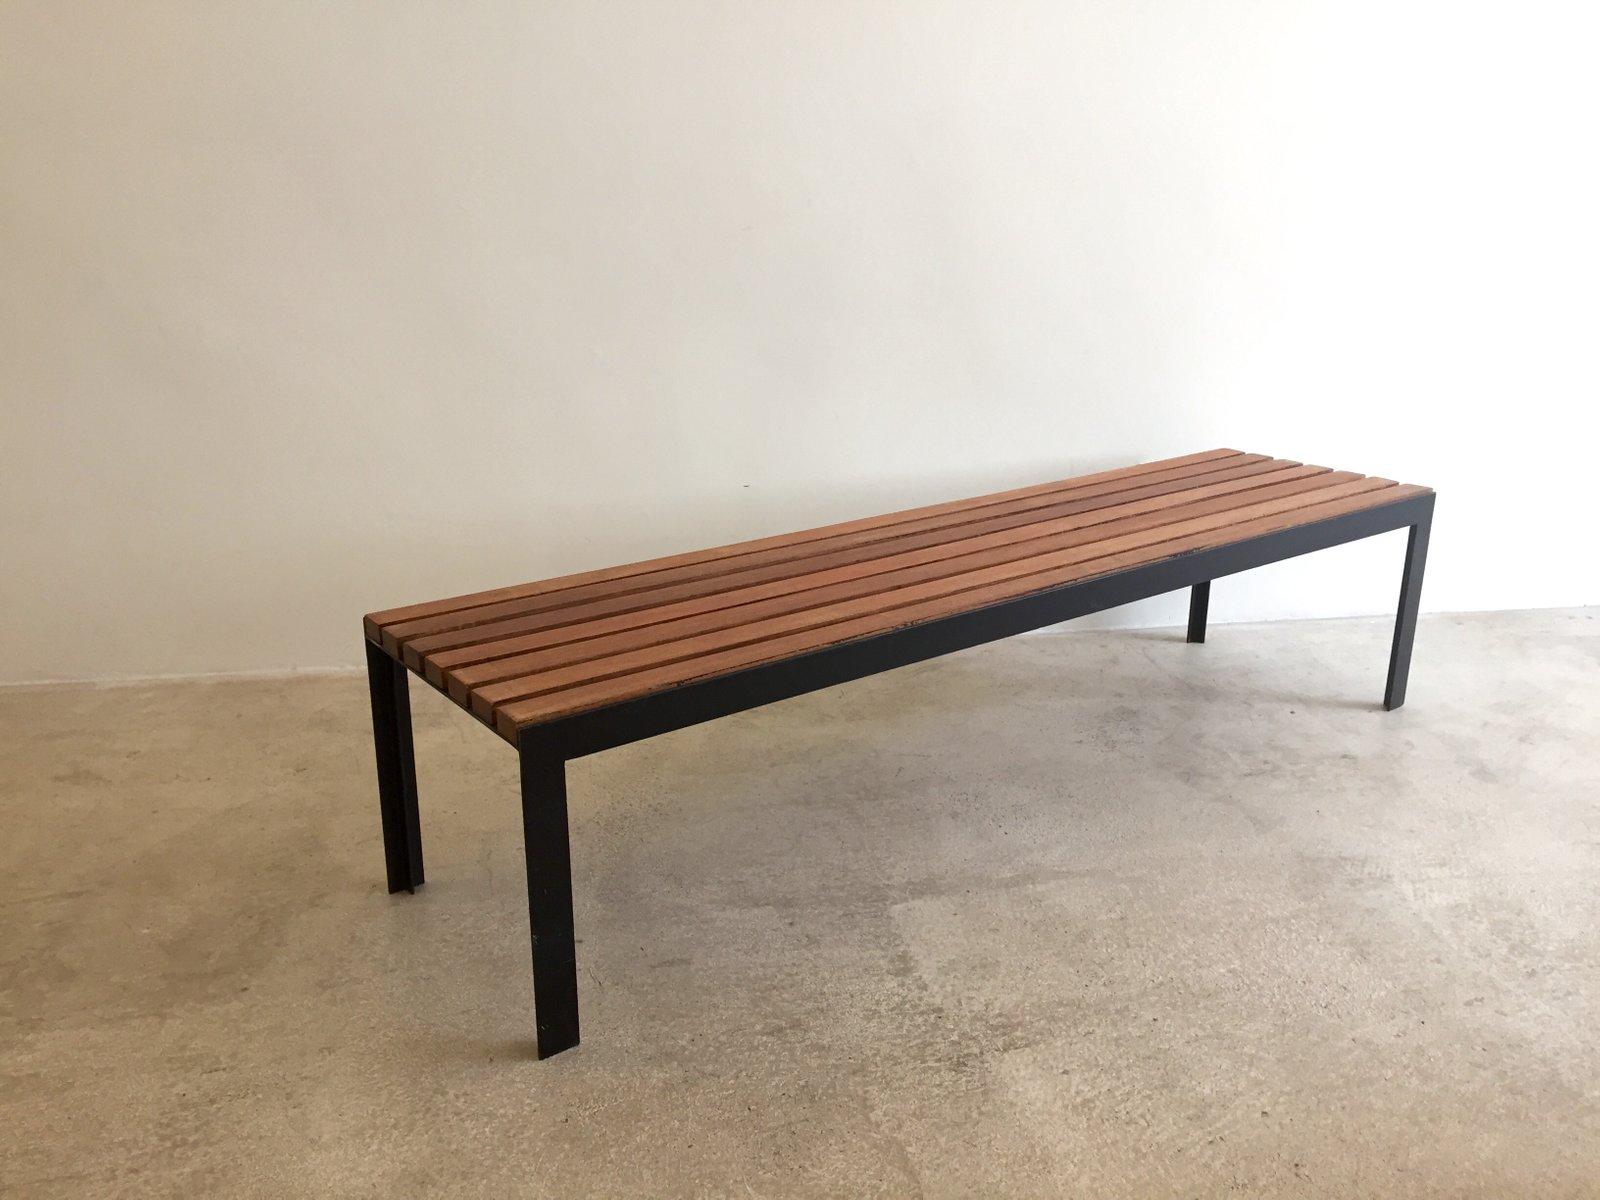 Modernist T Slat Bench 1965 for sale at Pamono